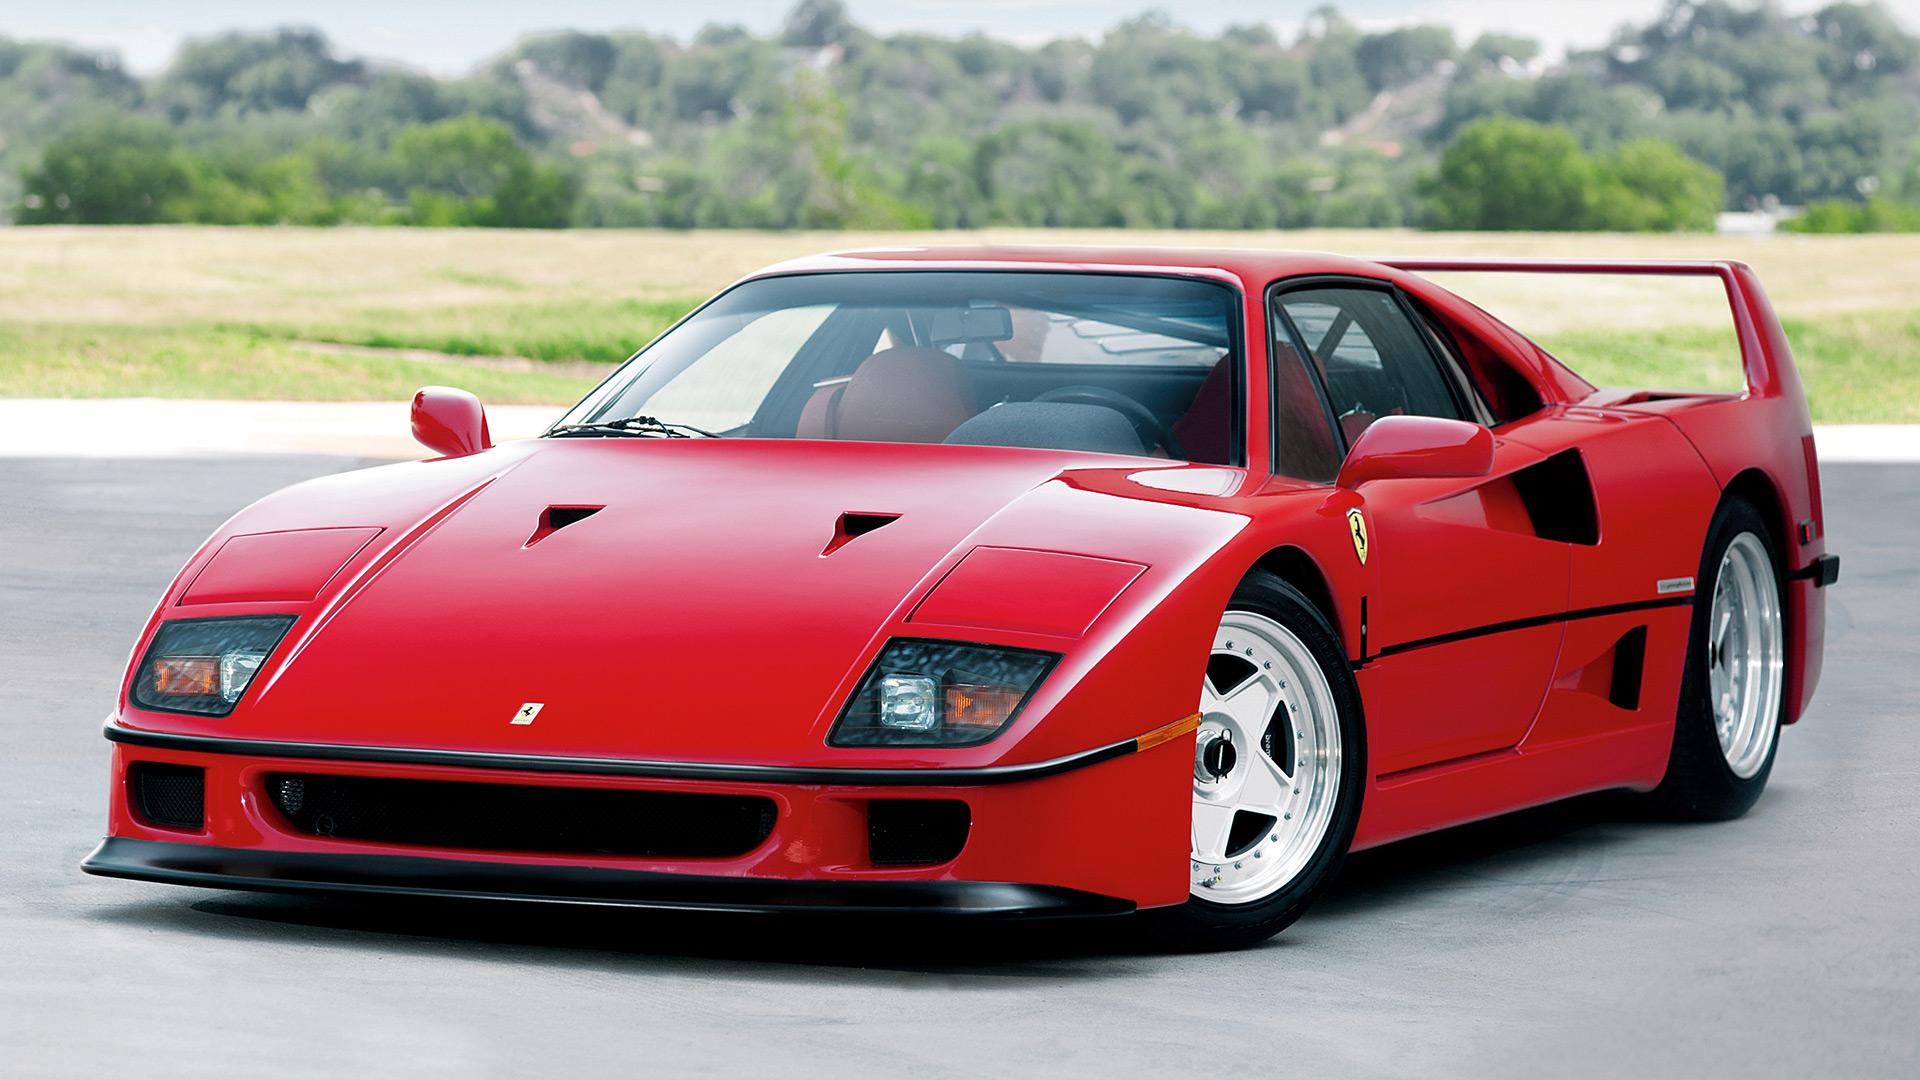 Car Ferrari F40 Red Car Sport Car Supercar 1920x1080